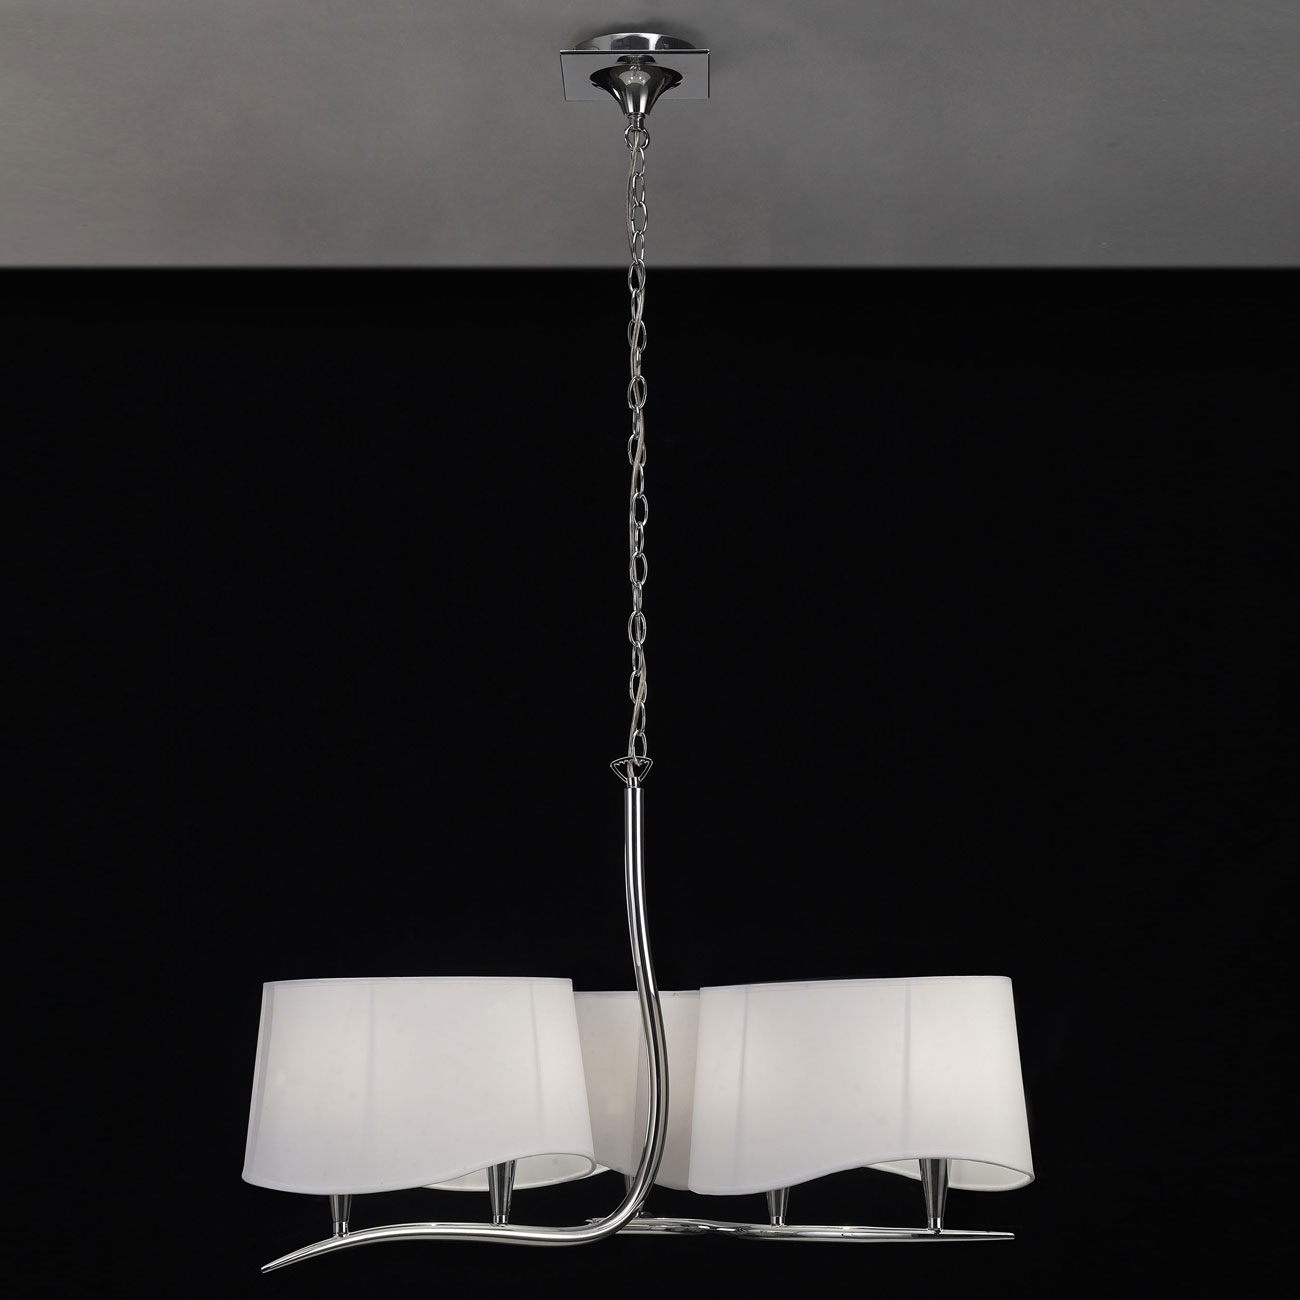 Ninette Lámpara Colgante 6xE14 20w Cromo pantalla blanca